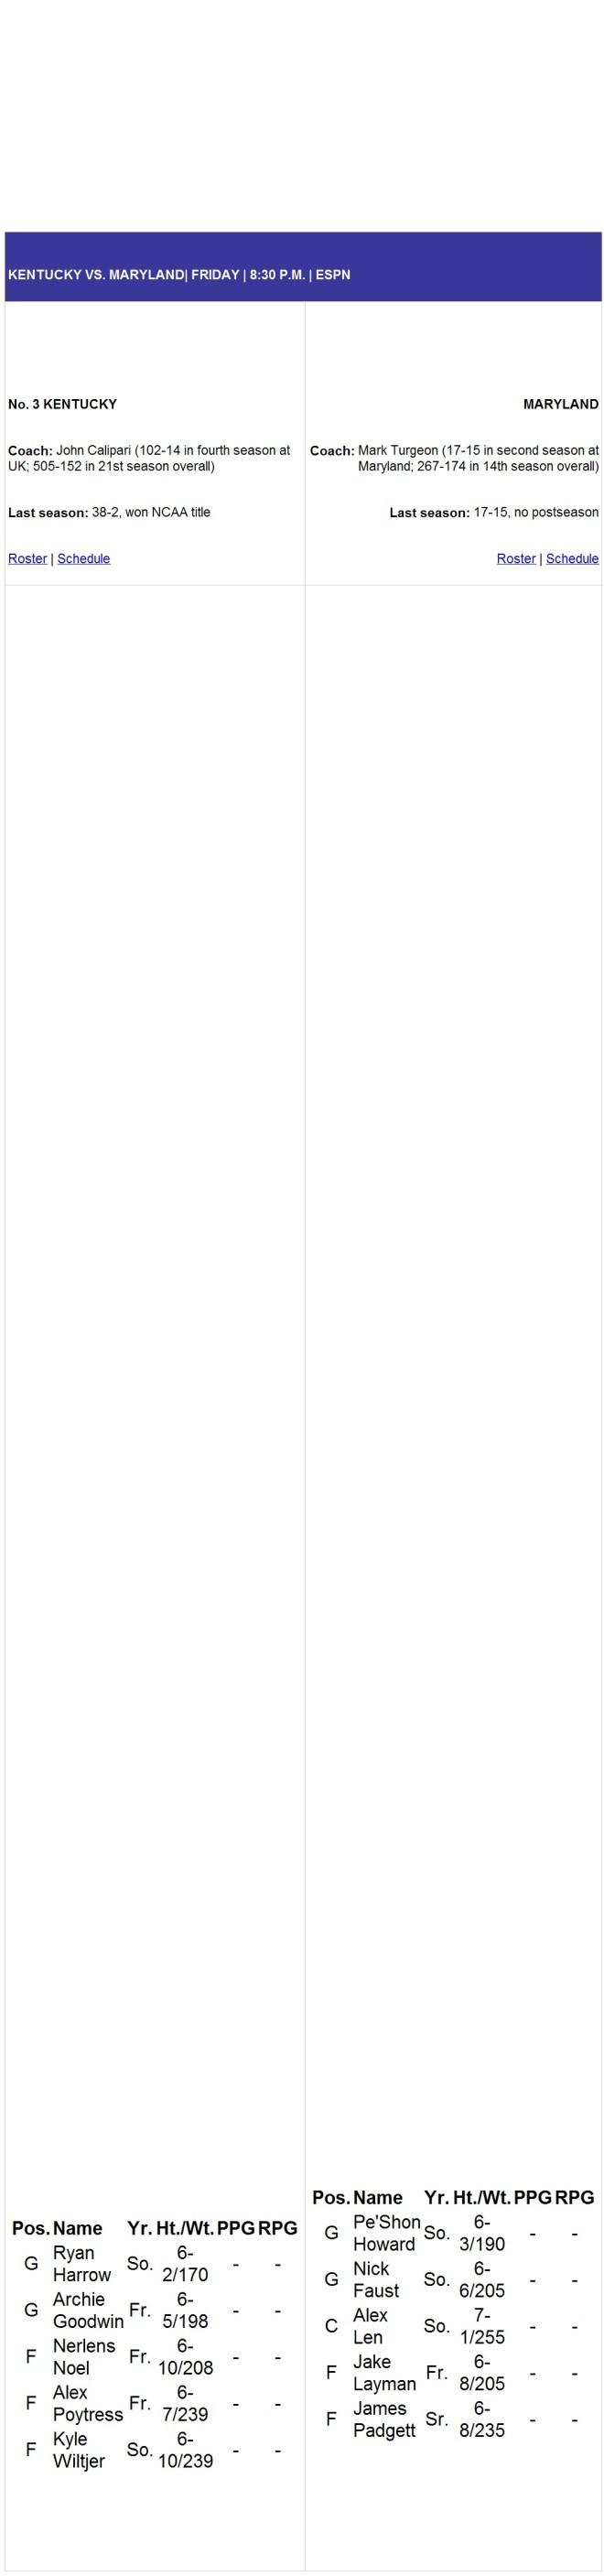 Djxdnorbfmo9389s5bnh